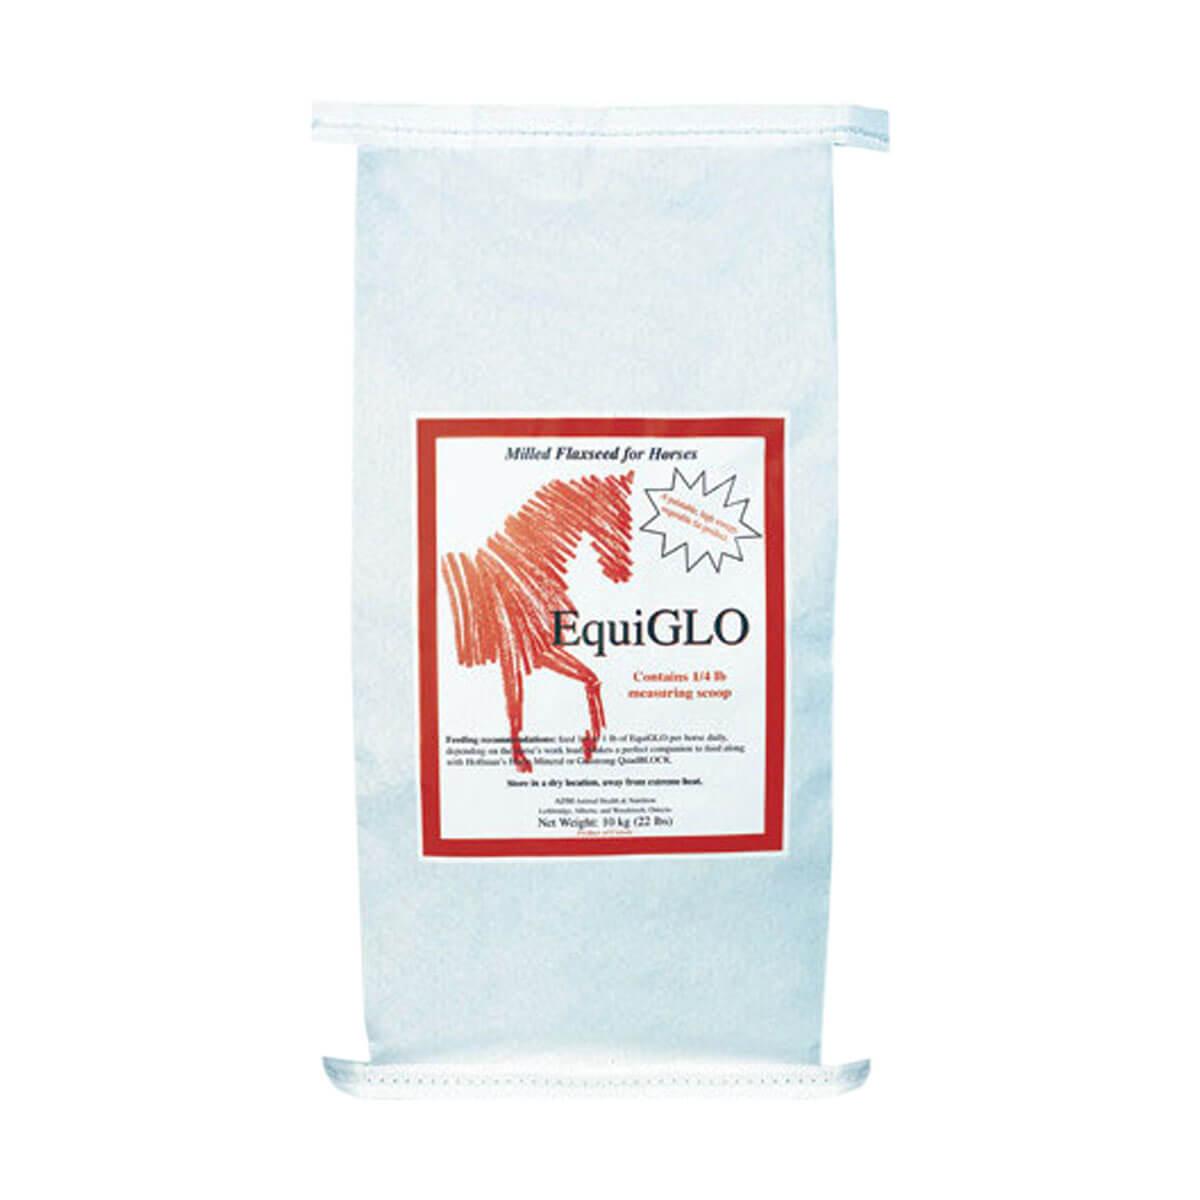 EquiGLO Milled Flaxseed - 22 lb